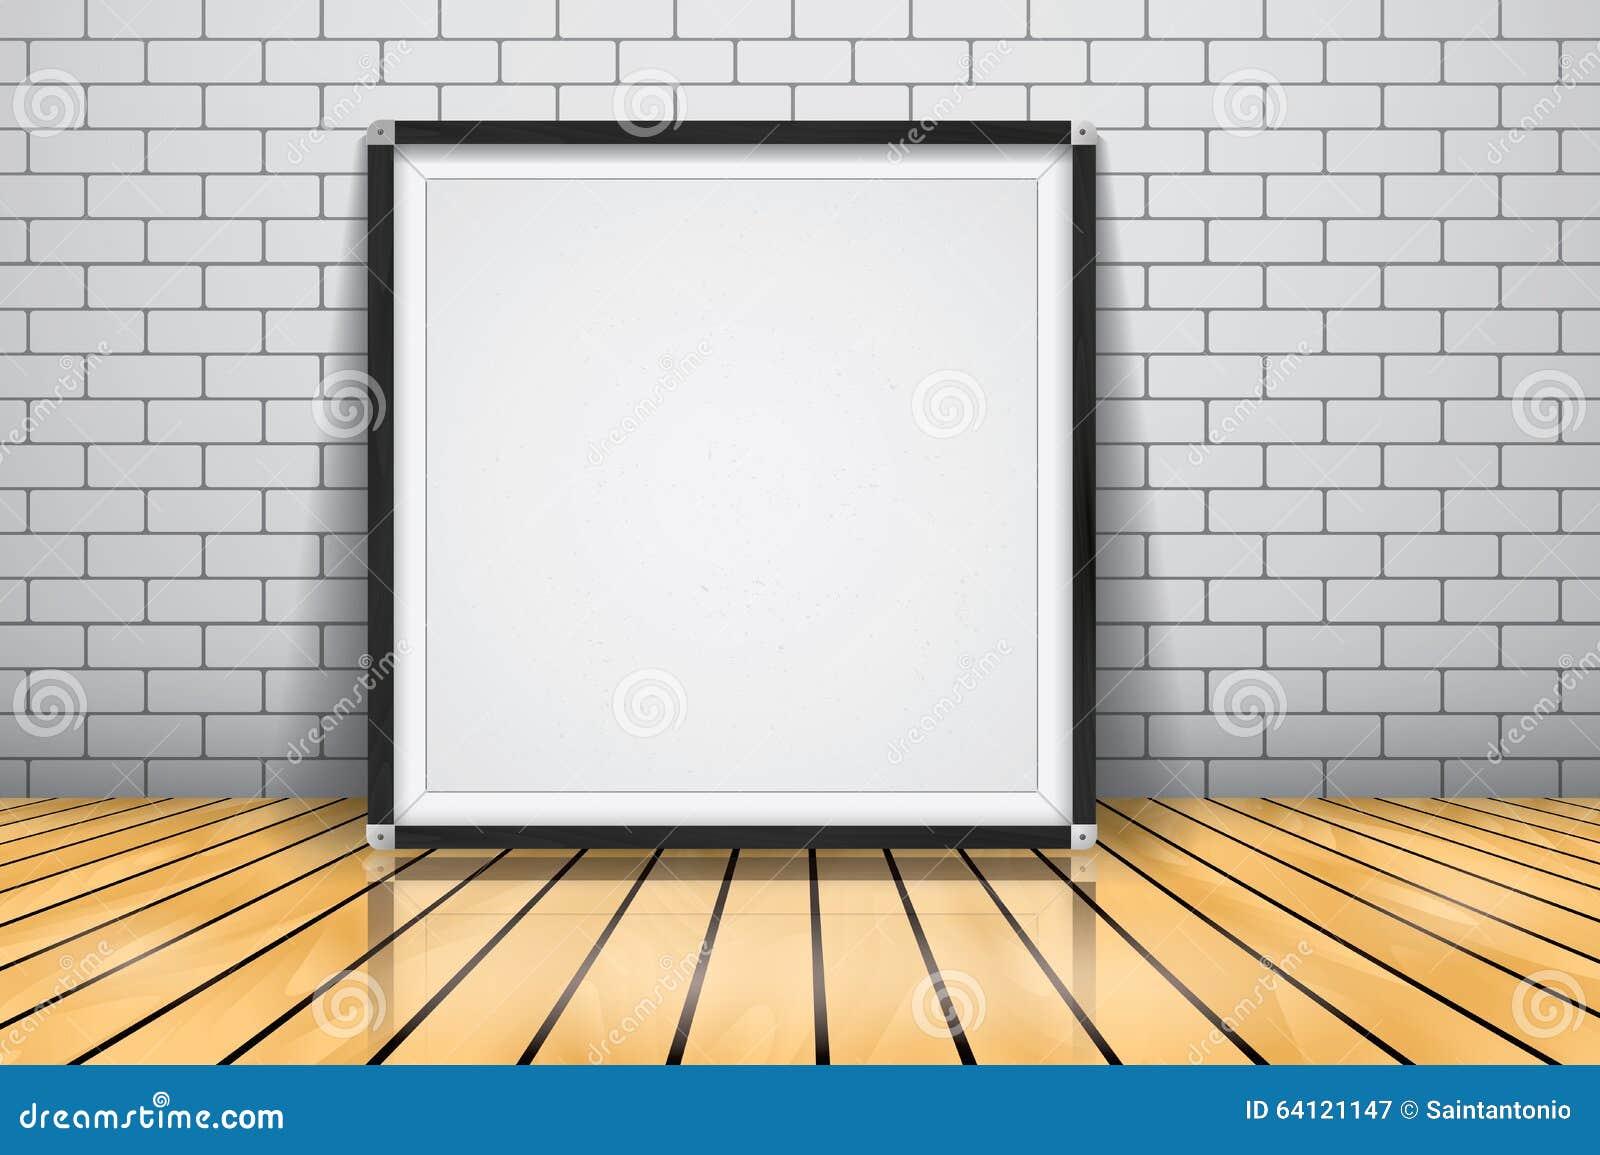 Mock Up For Presentation Framed Signboard Standing On Glossy Wooden ...